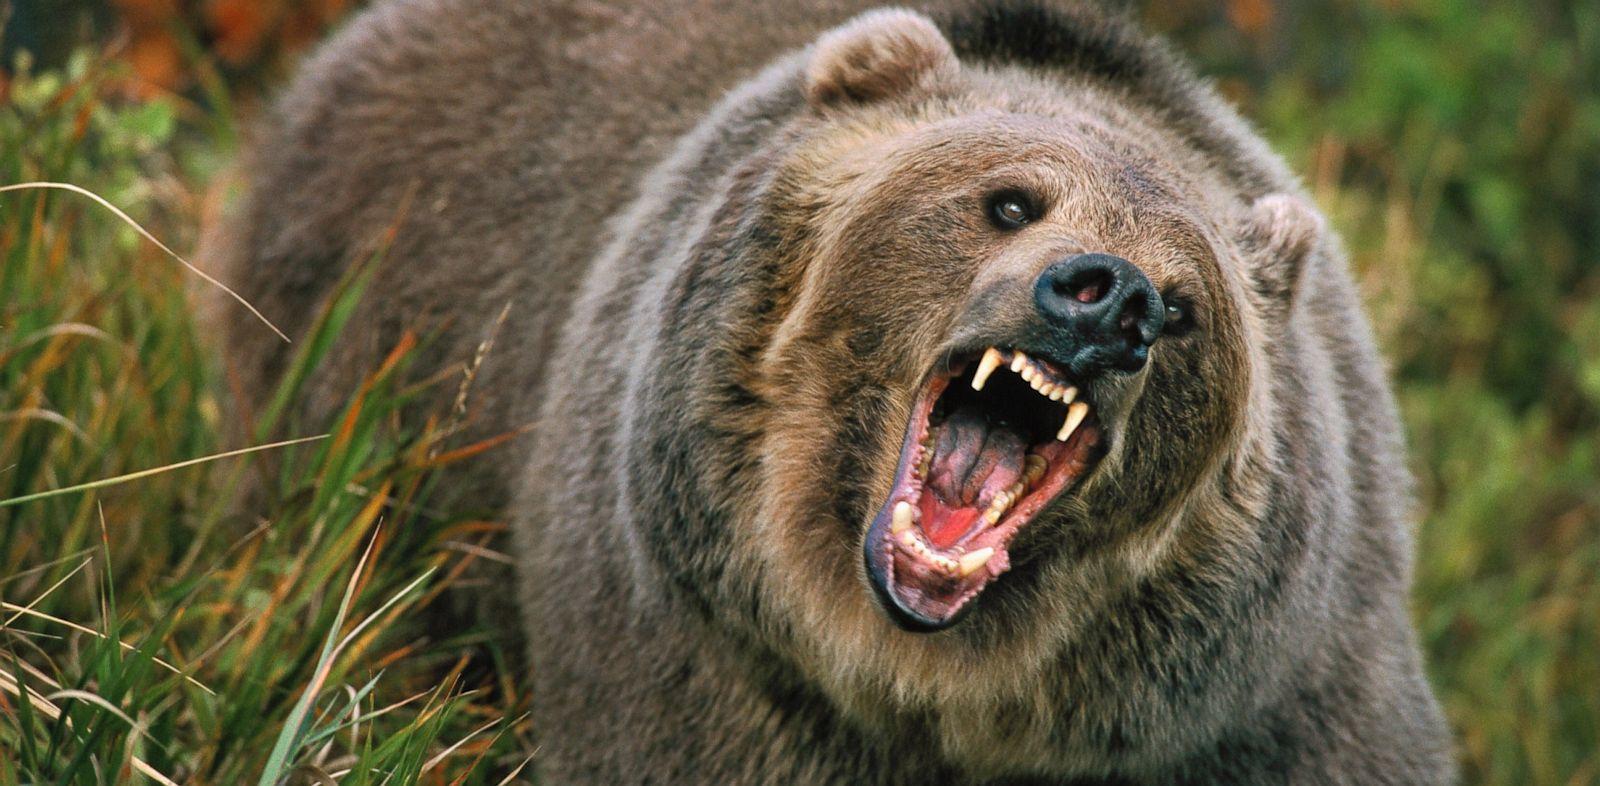 Bear attacks raise safety concerns